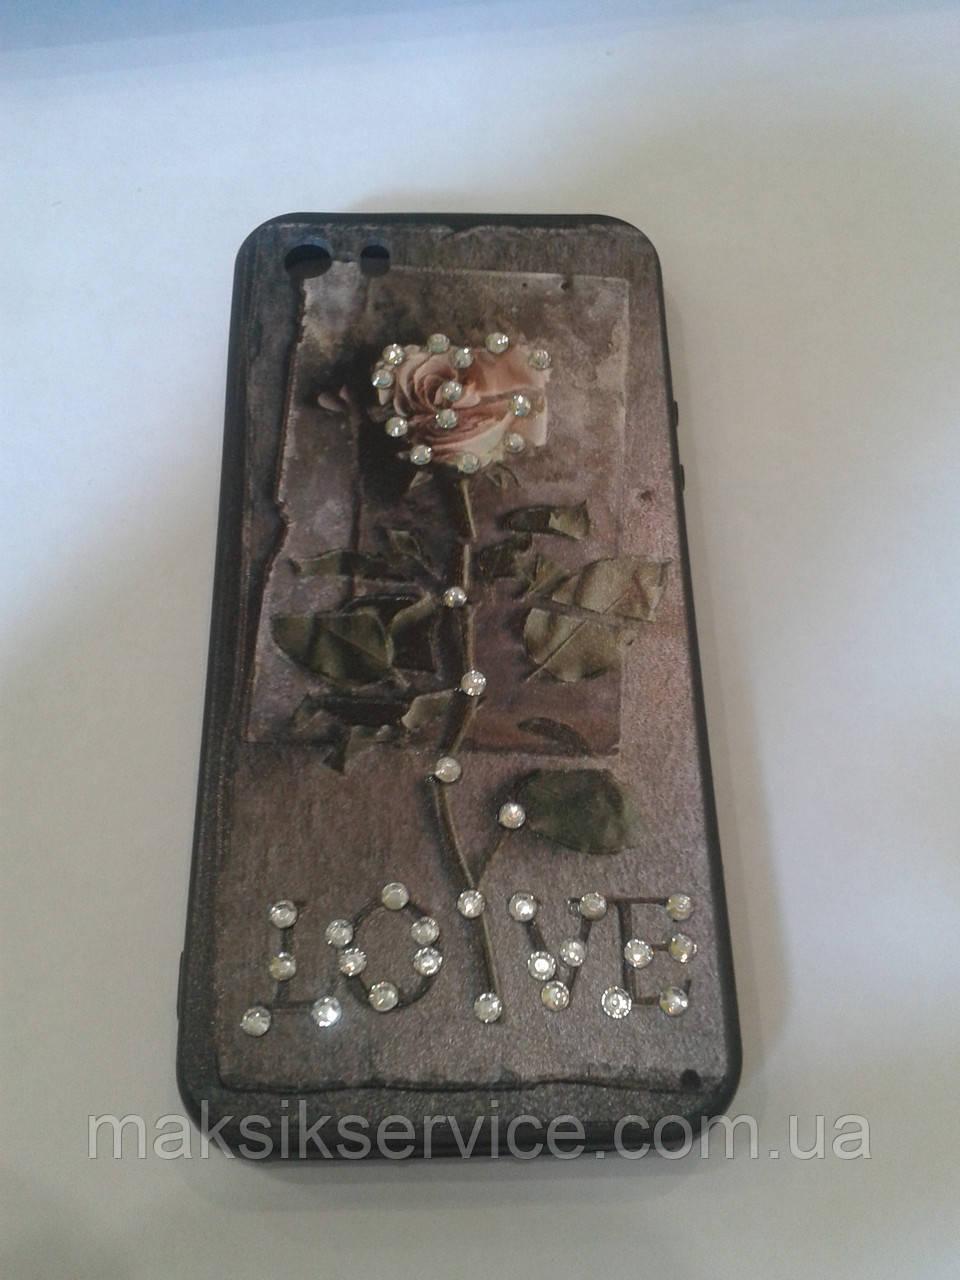 Чехол-Накладка на Iphone 5 5s flowers